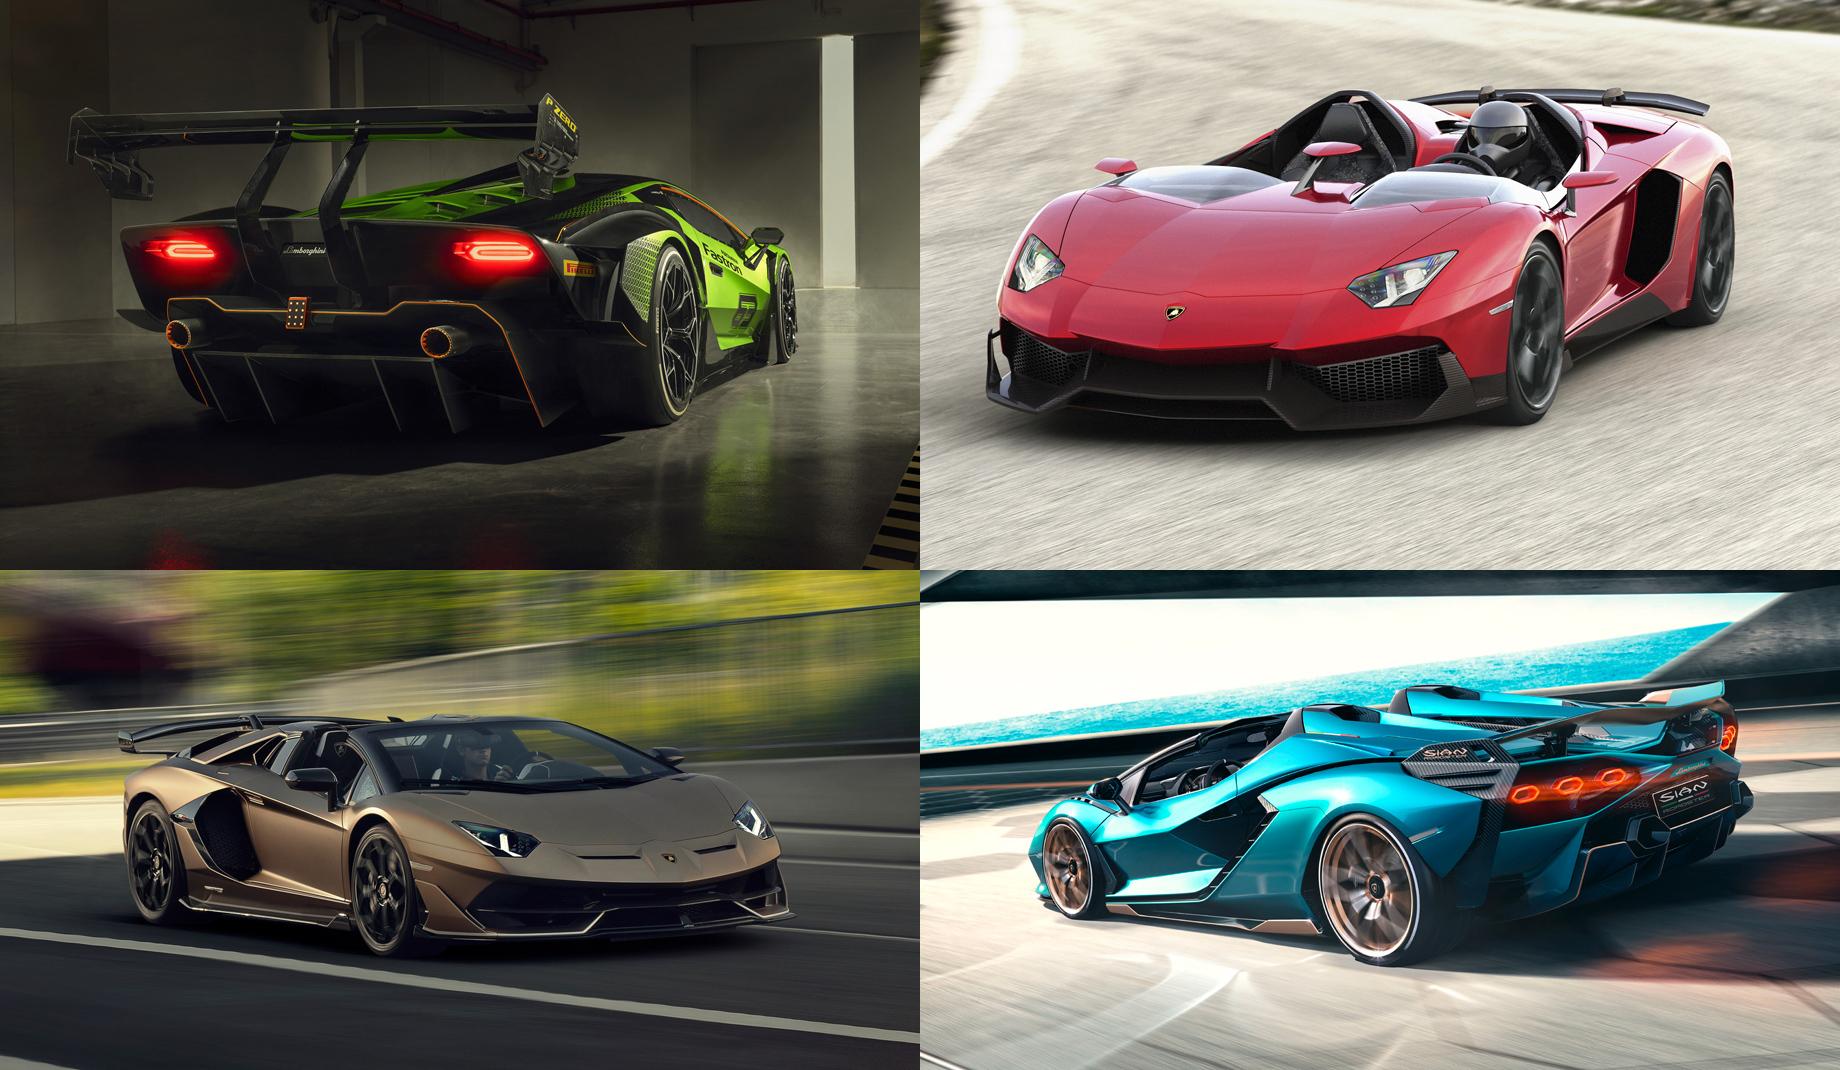 Lamborghini намекнула набезумный гиперкар SCV12 Aperta